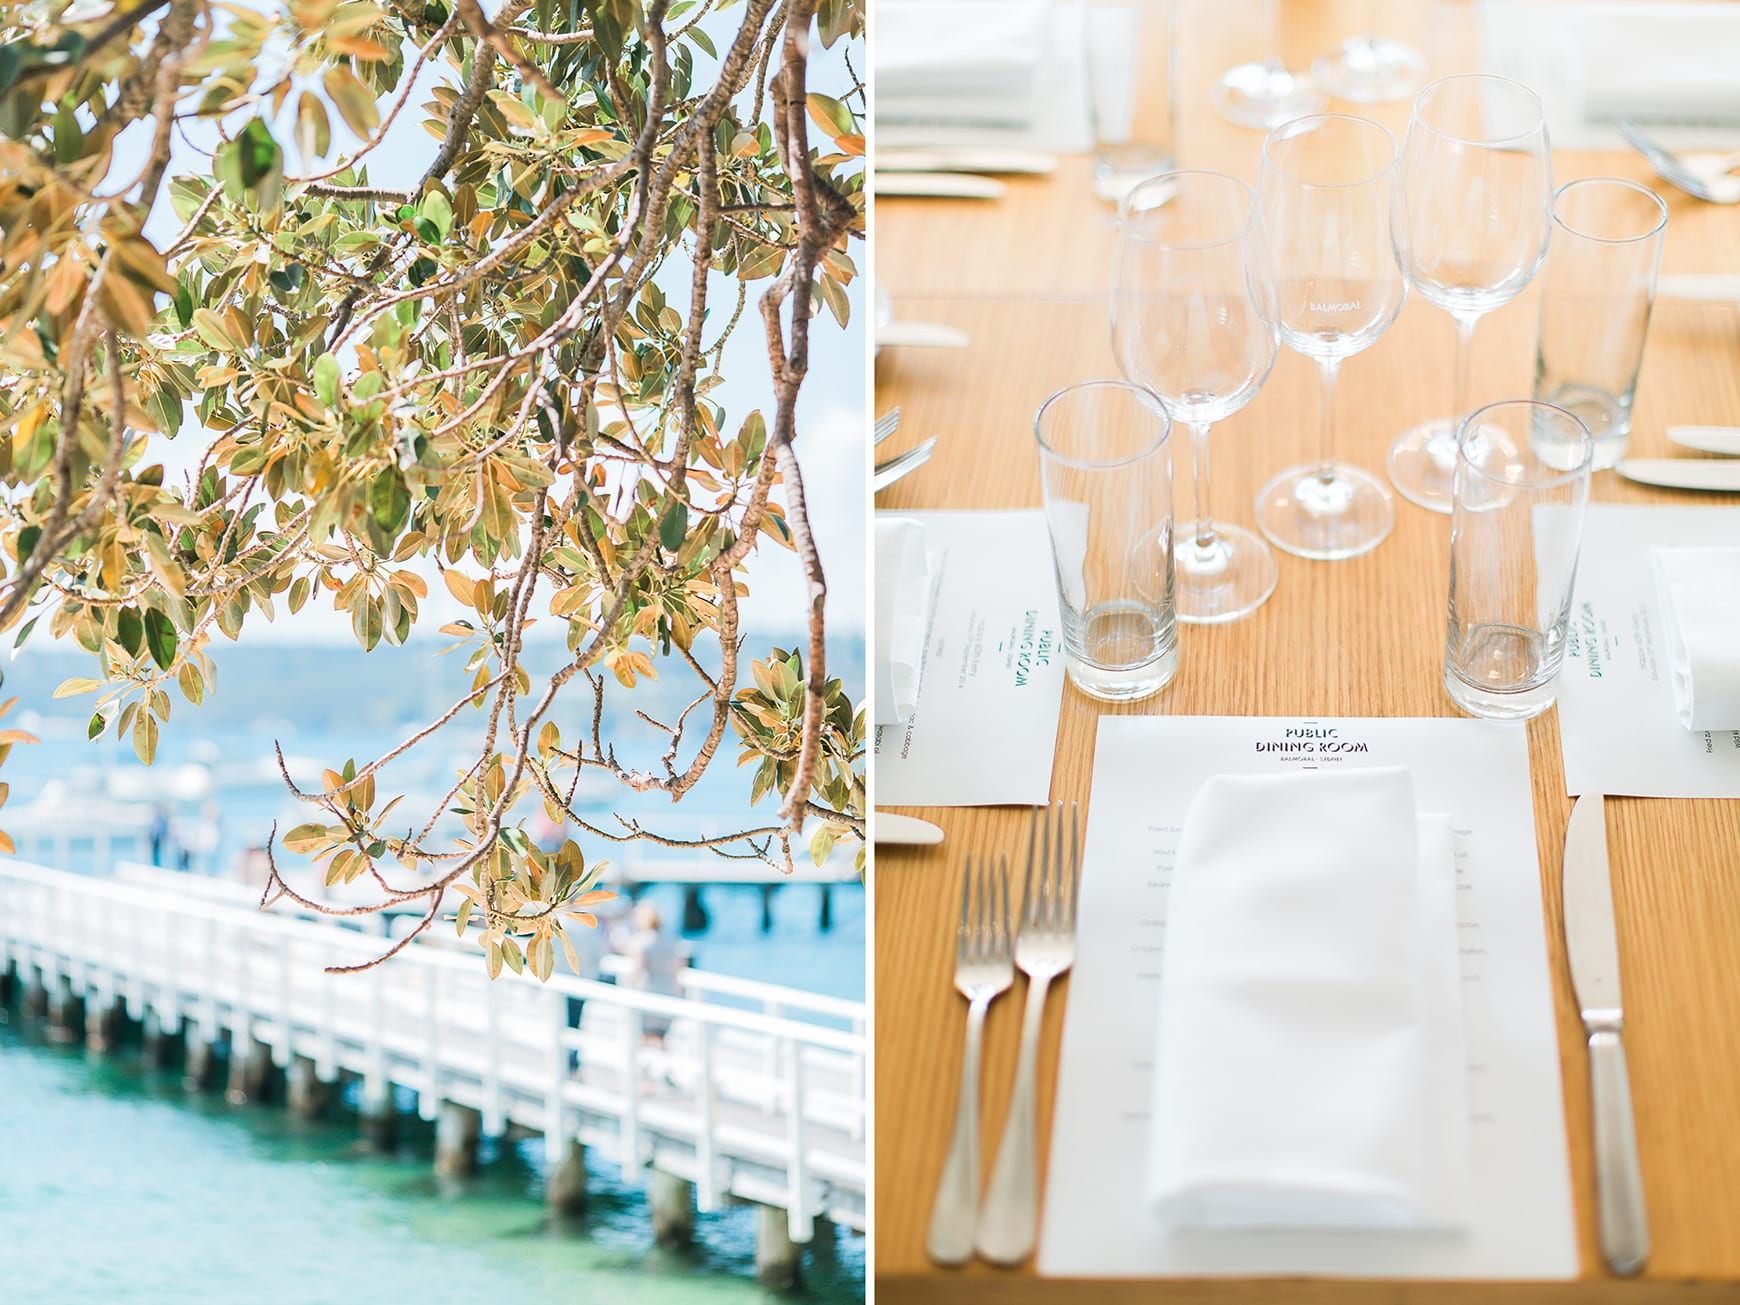 the public dining room | BALMORAL | PUBLIC DINING ROOM - Elin Bandmann Photography ...